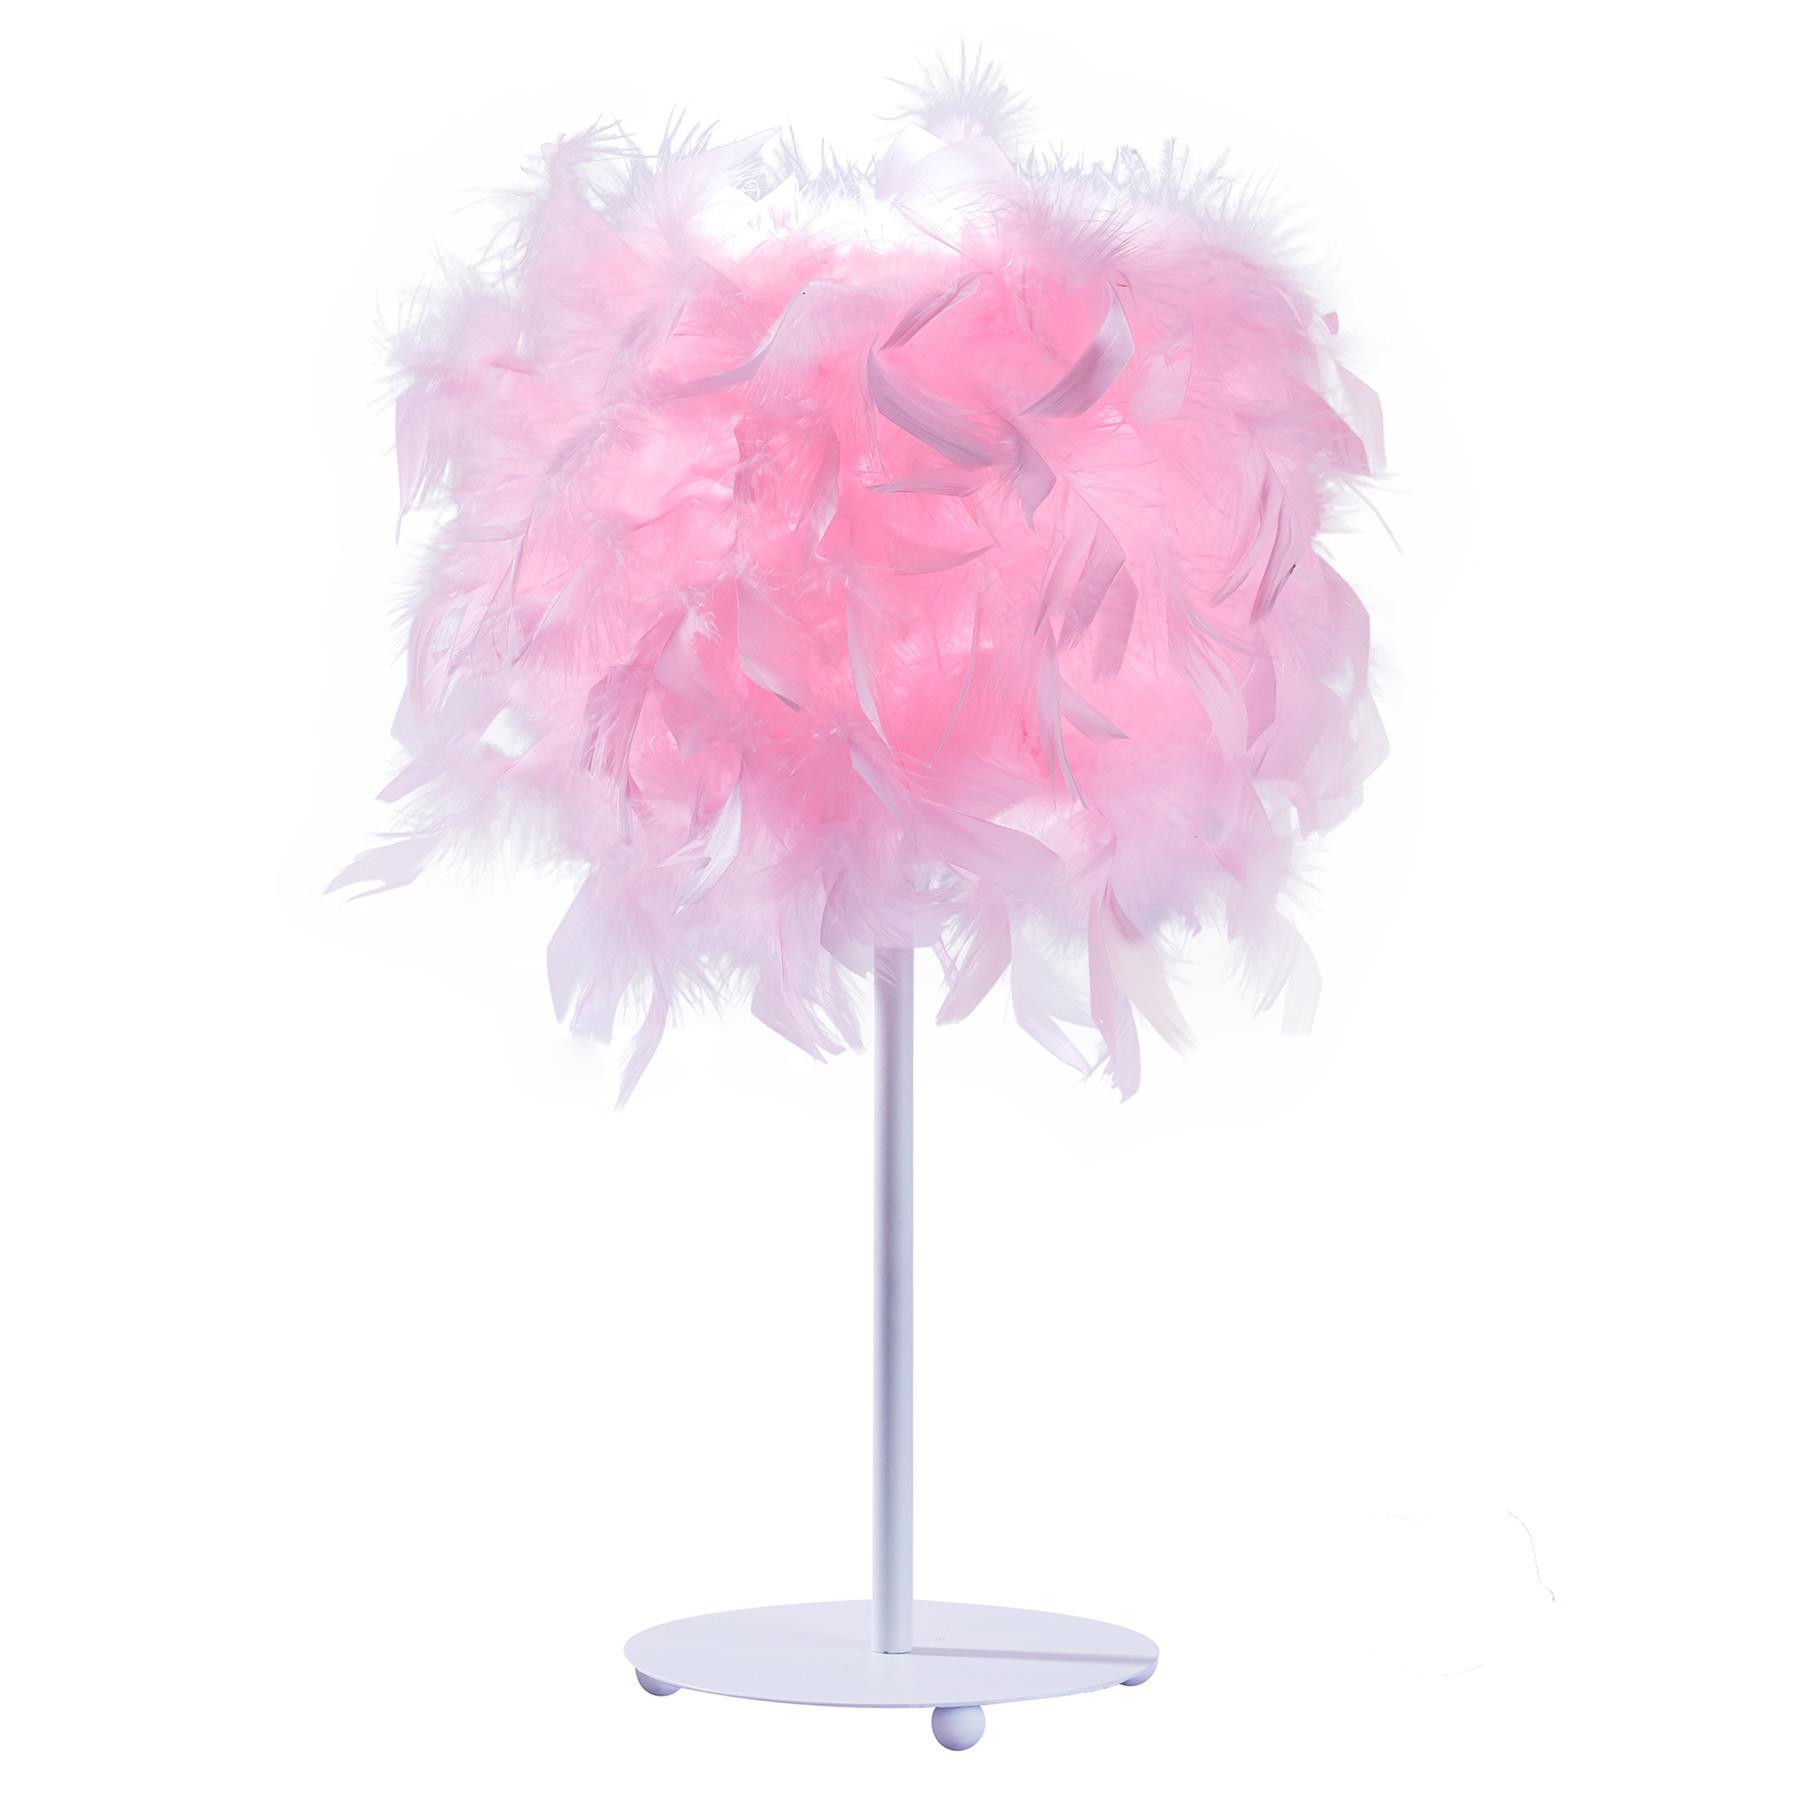 thumbnail 3 - White-Pink-Elegant-Feather-Lampshade-Bedside-Table-Desk-Lamp-Light-Decor